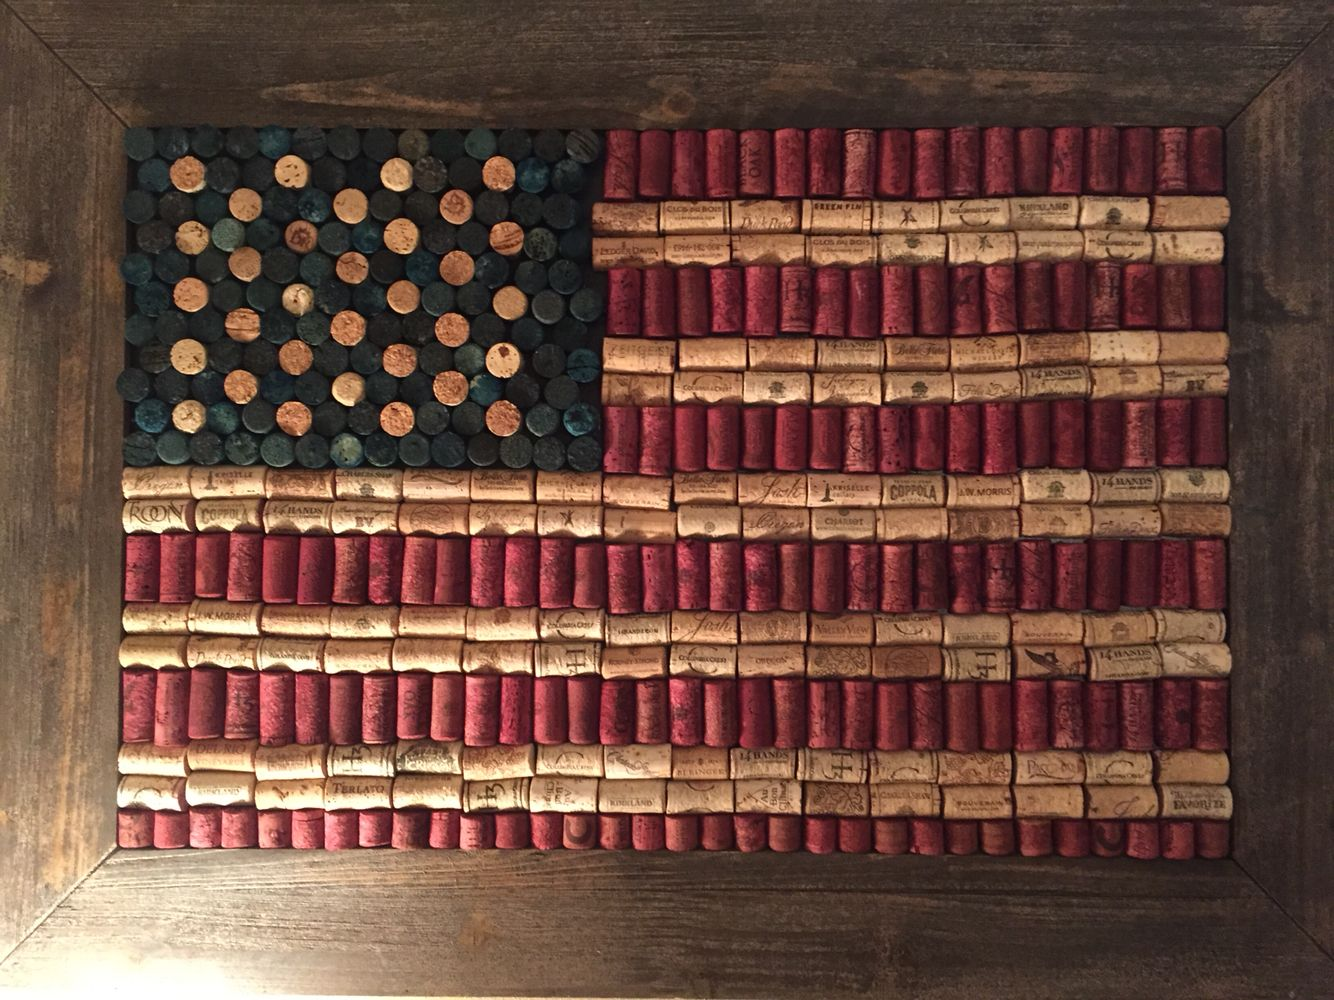 Wine bottle corks crafts - Wine Bottle Corks Crafts 26